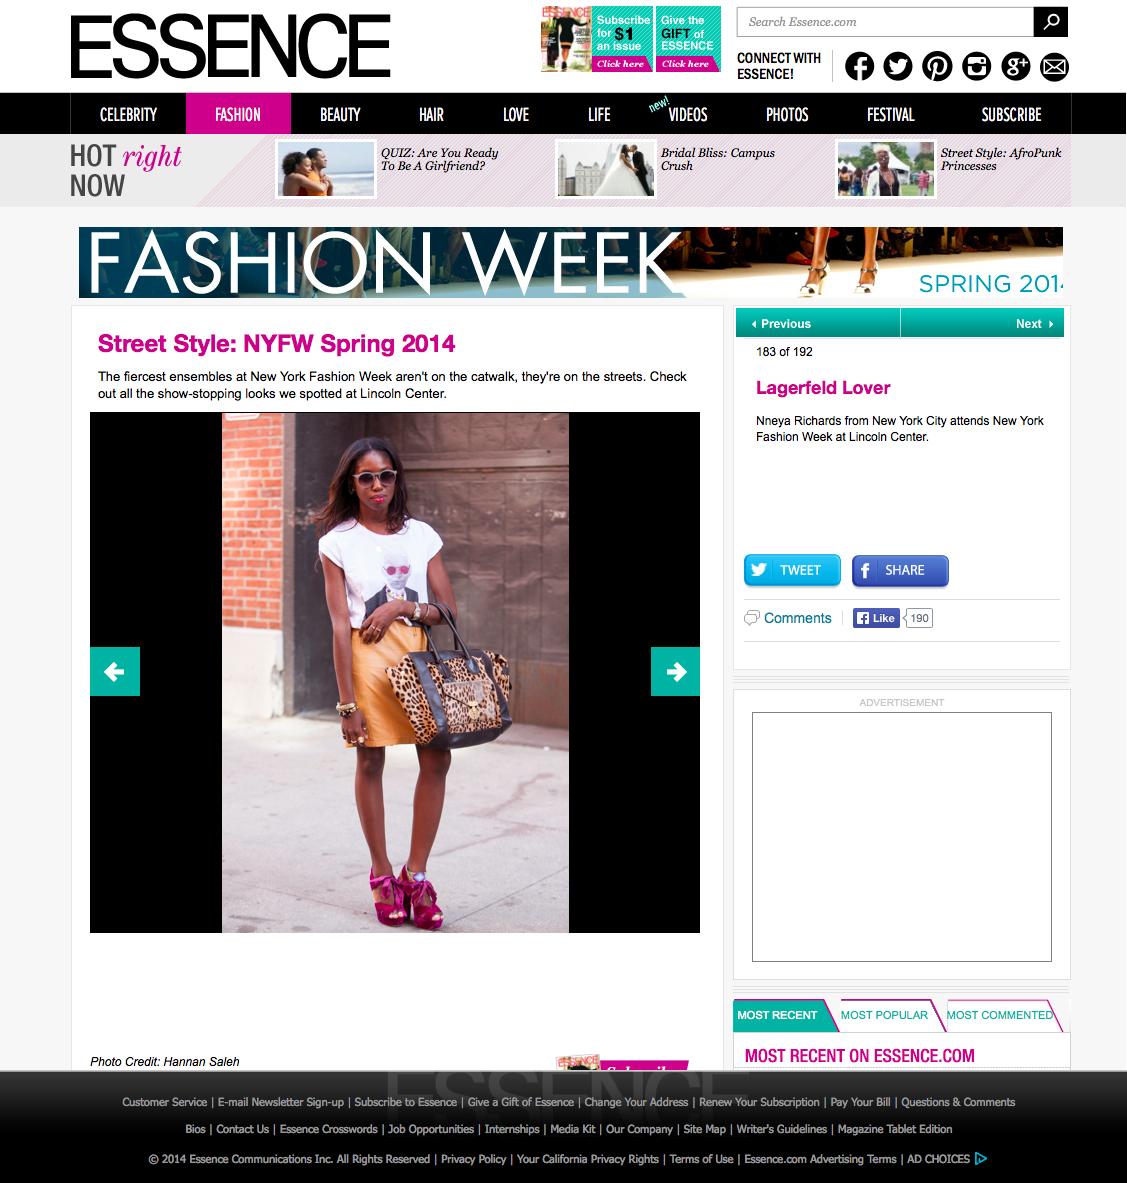 Essence online September 2013